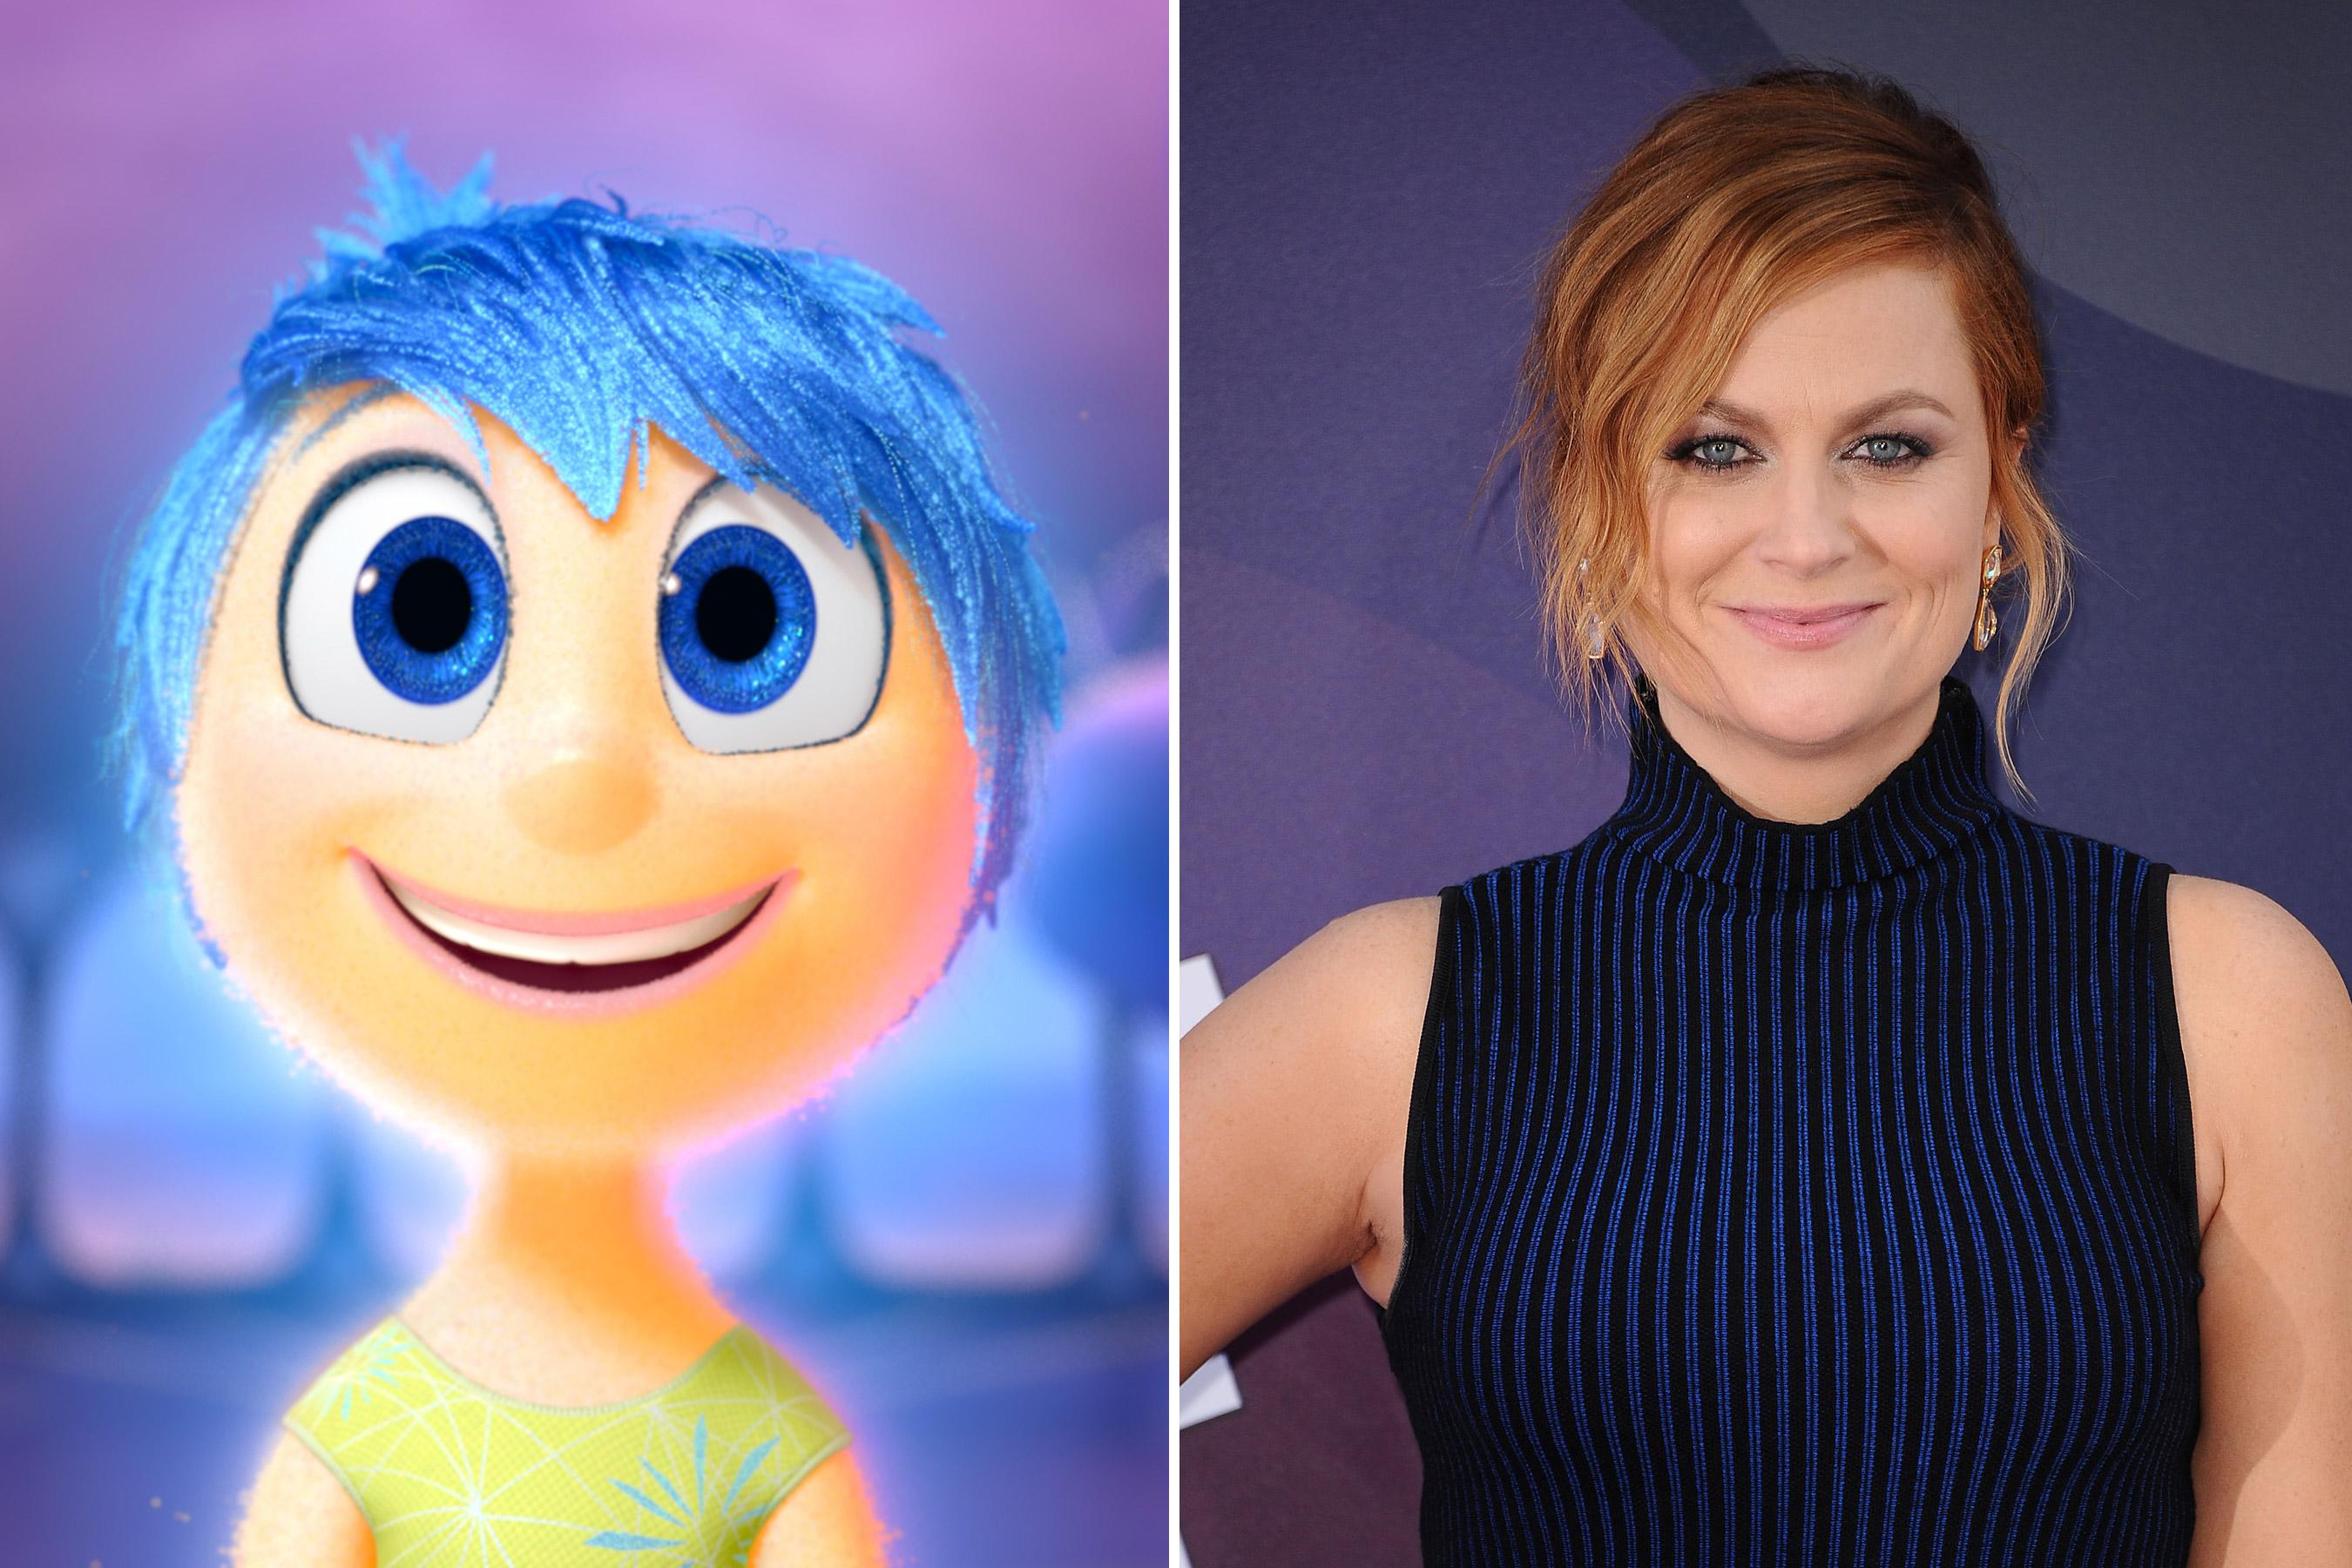 Pixar/Disney; Getty Images